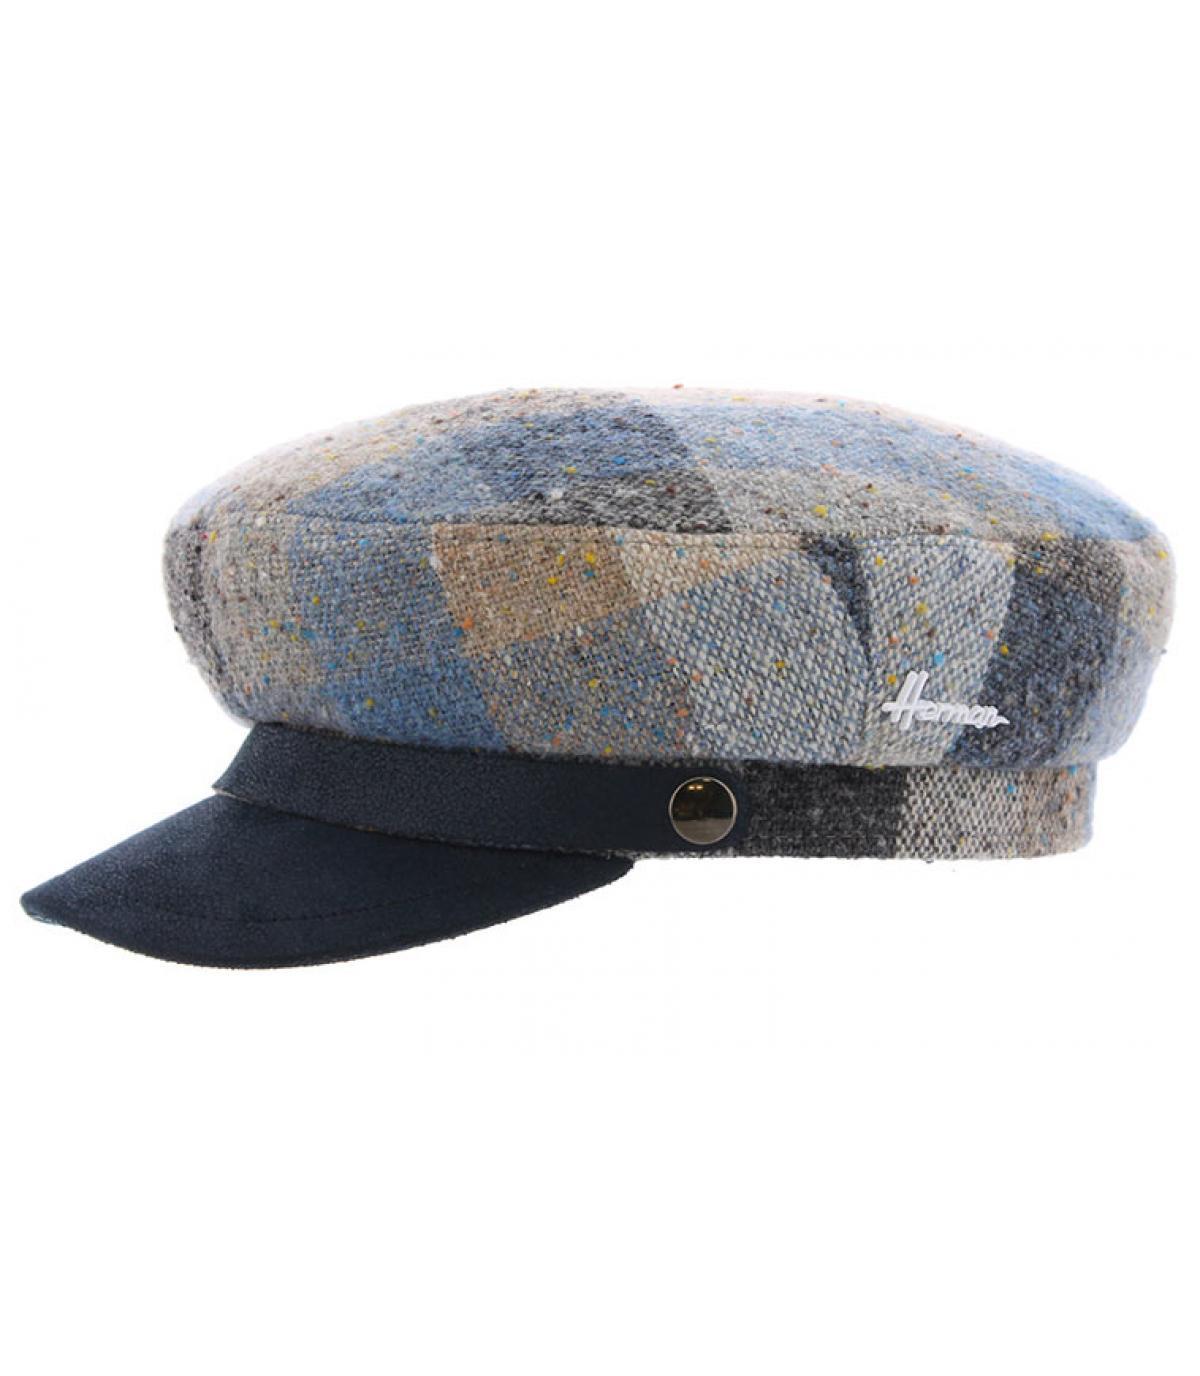 blue fisherman cap check